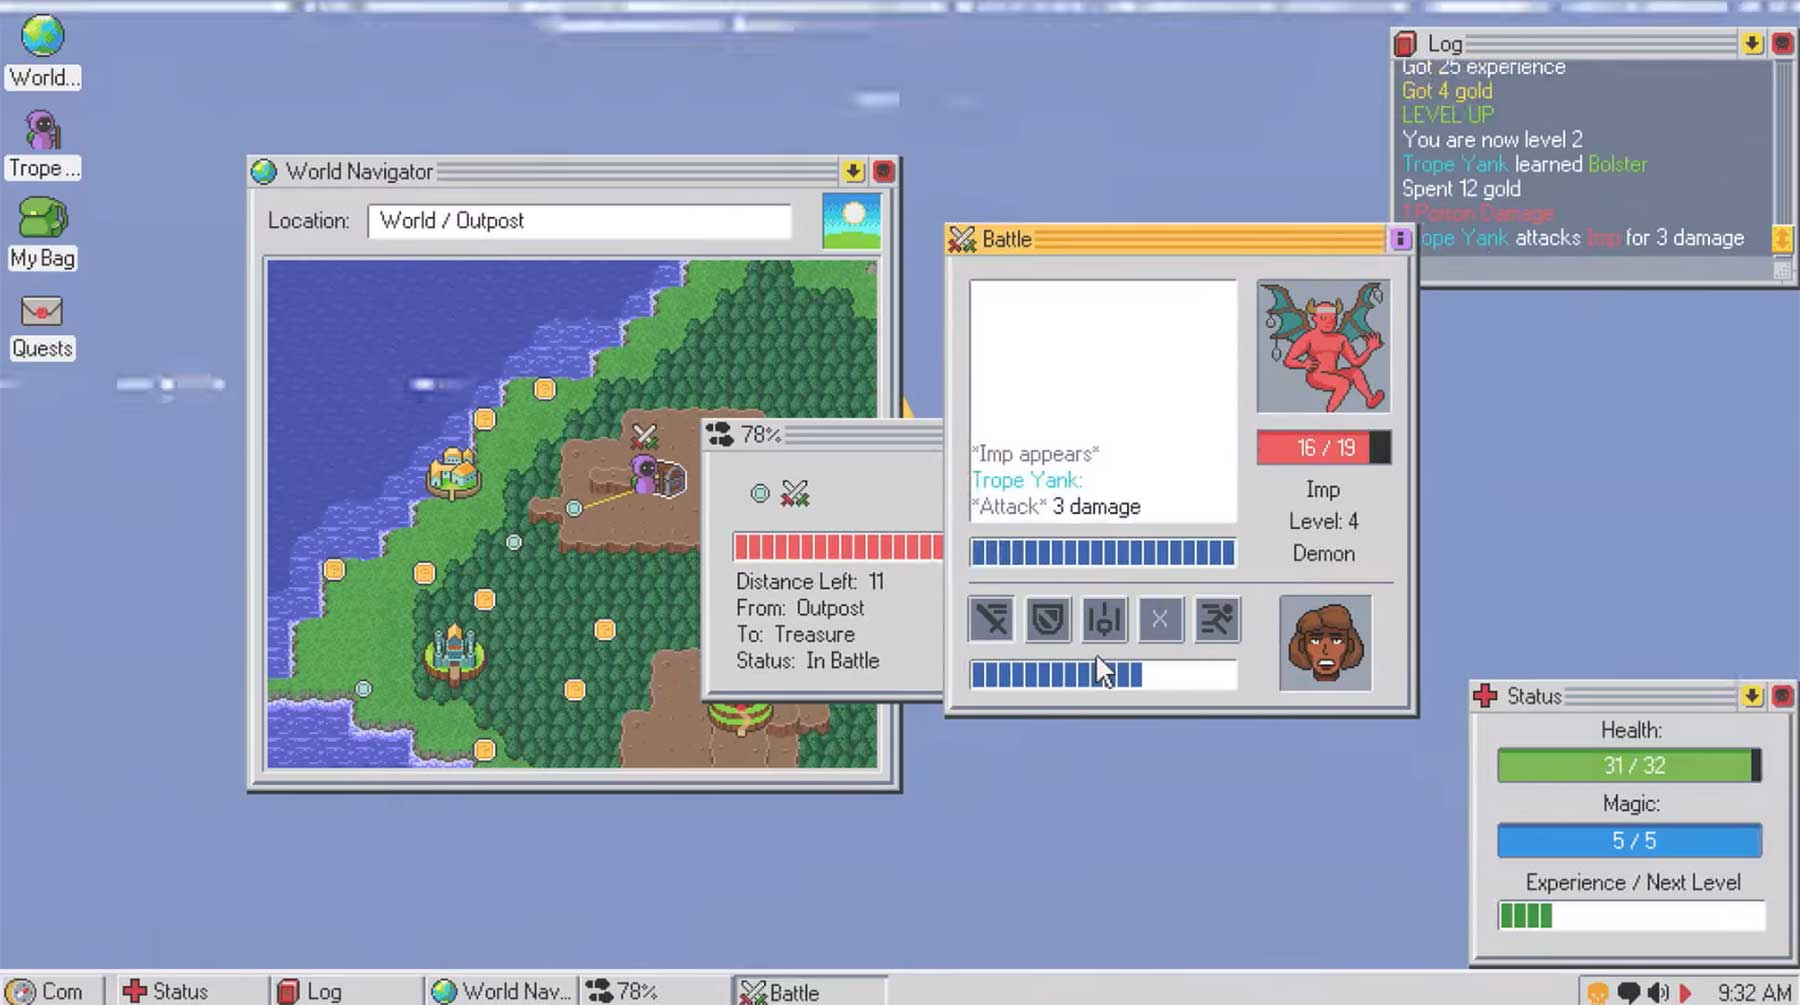 Kingsway ist ein RPG im Betriebssystem-Format